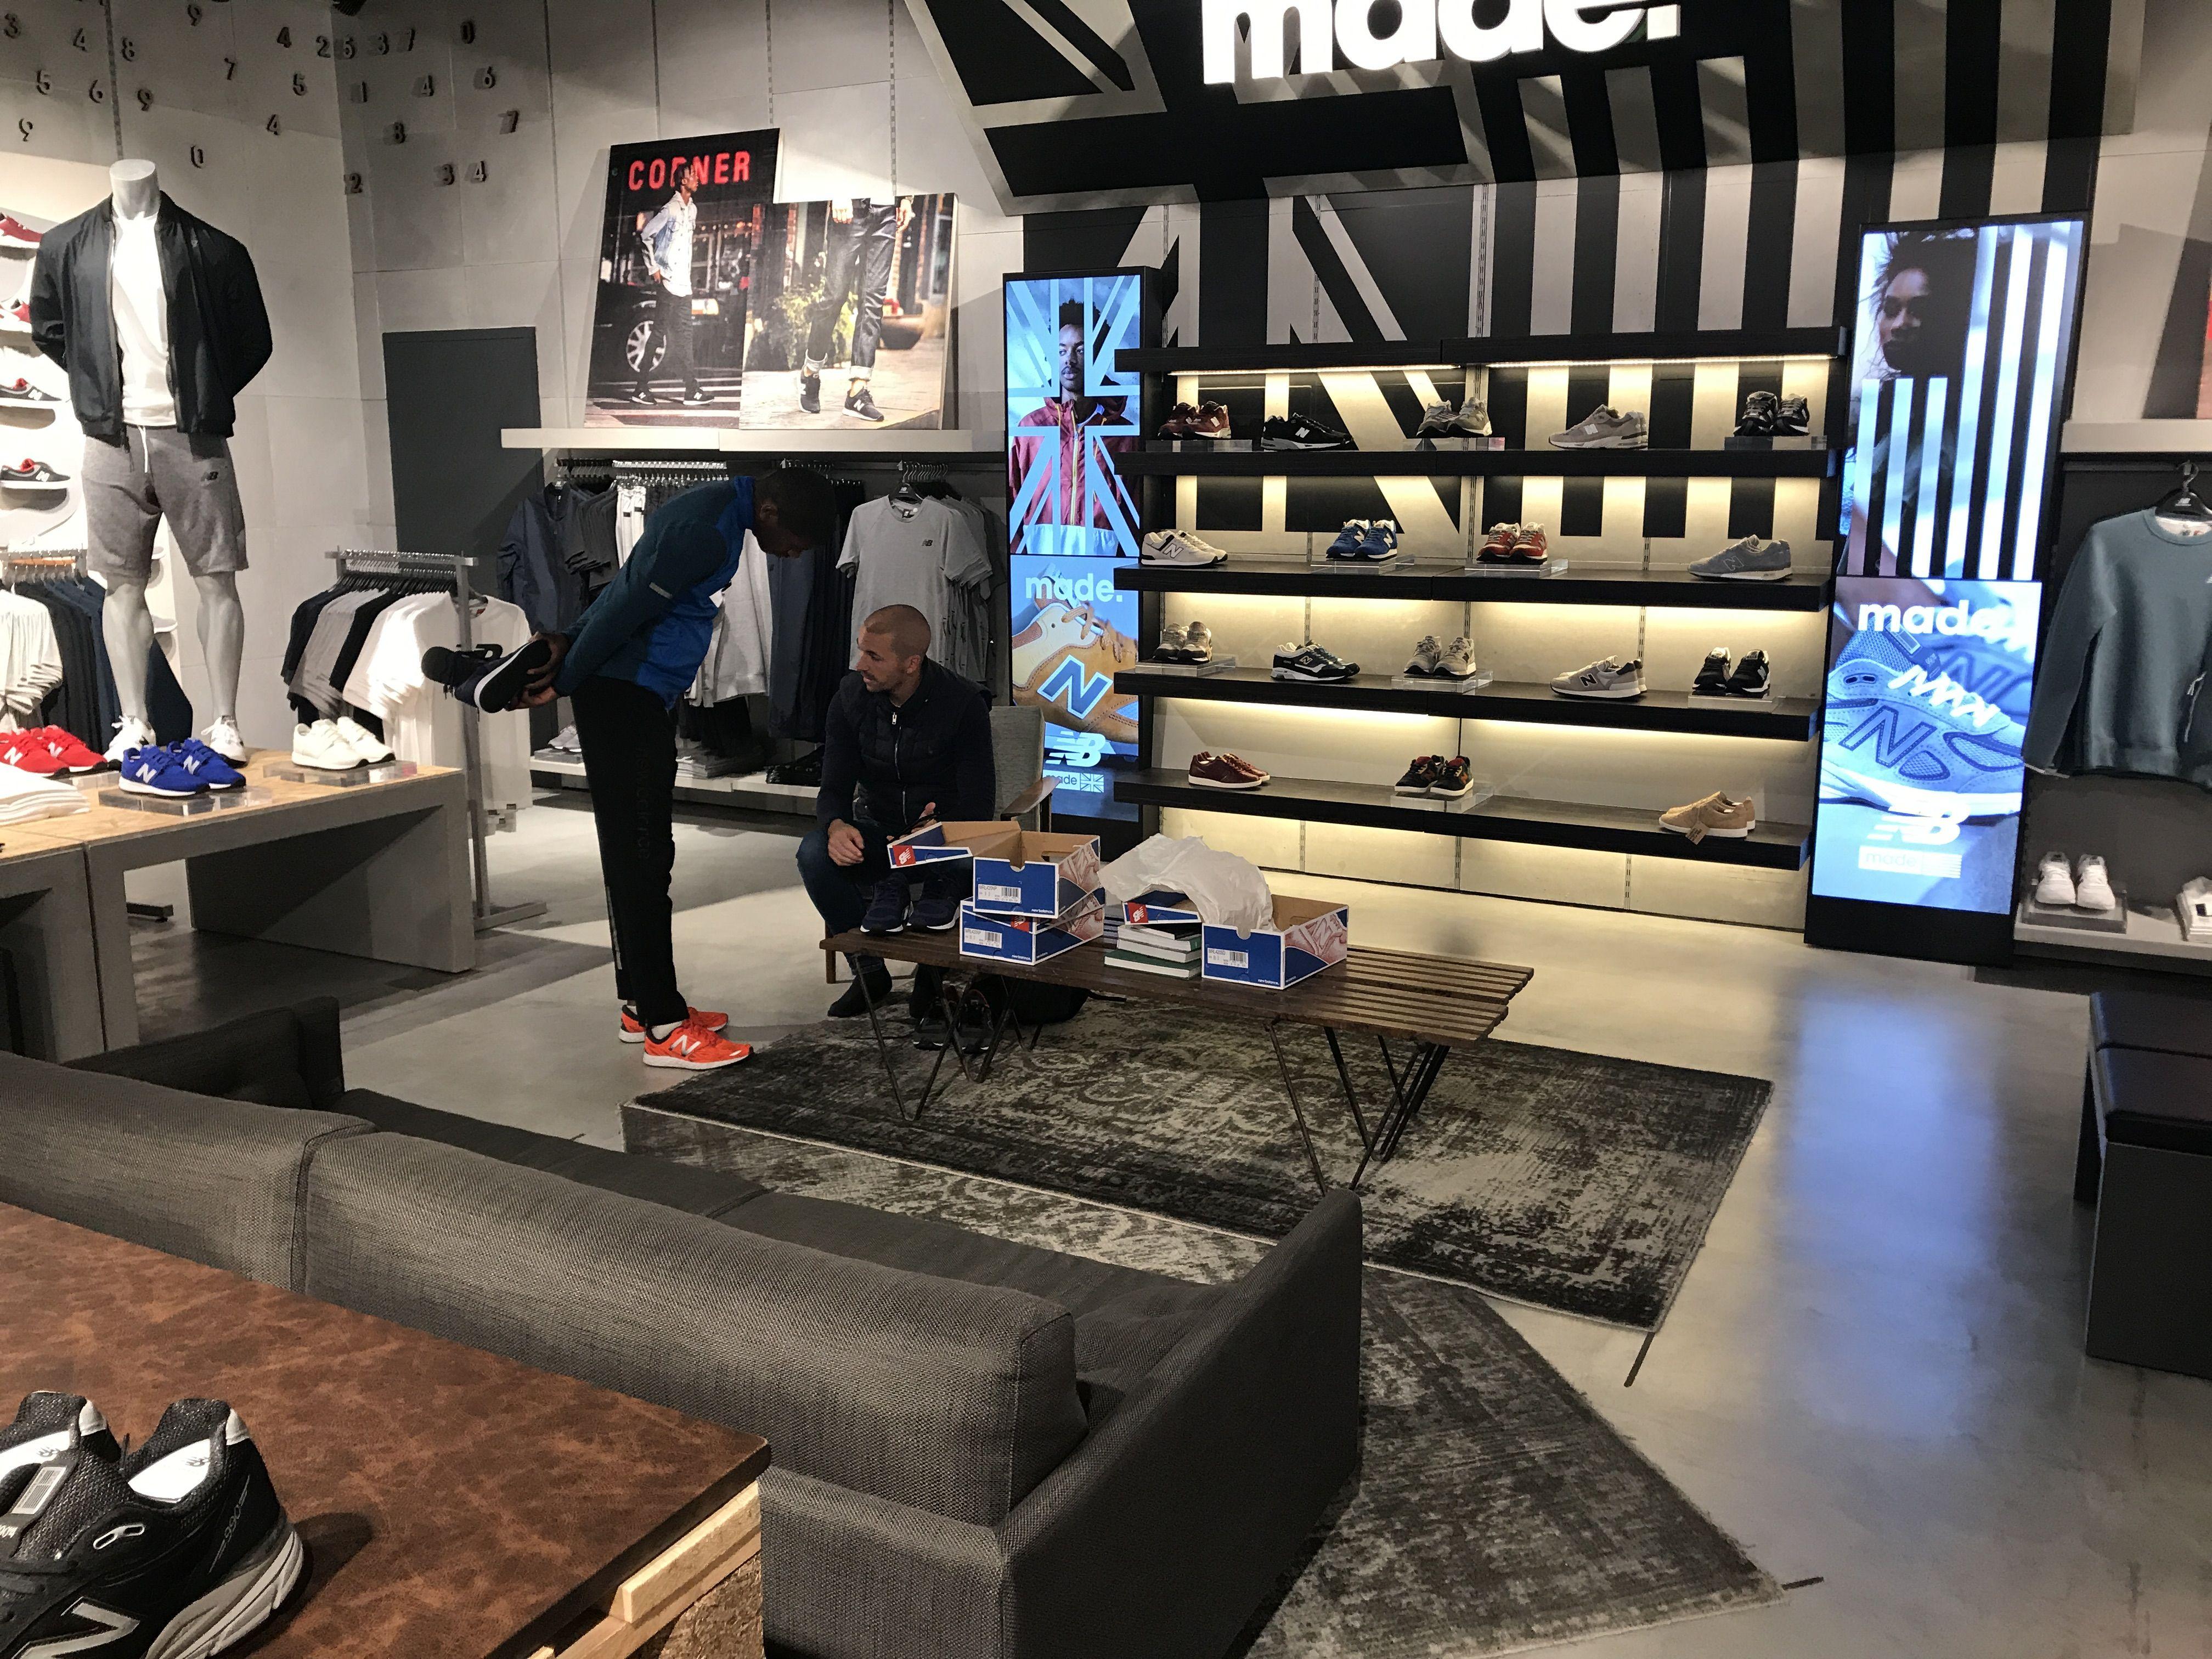 023cf1ed25 New Balance - Central London, April 2017 Footwear area #sportbrands #retail  #vm #visualmerchandising #newbalance #footwear